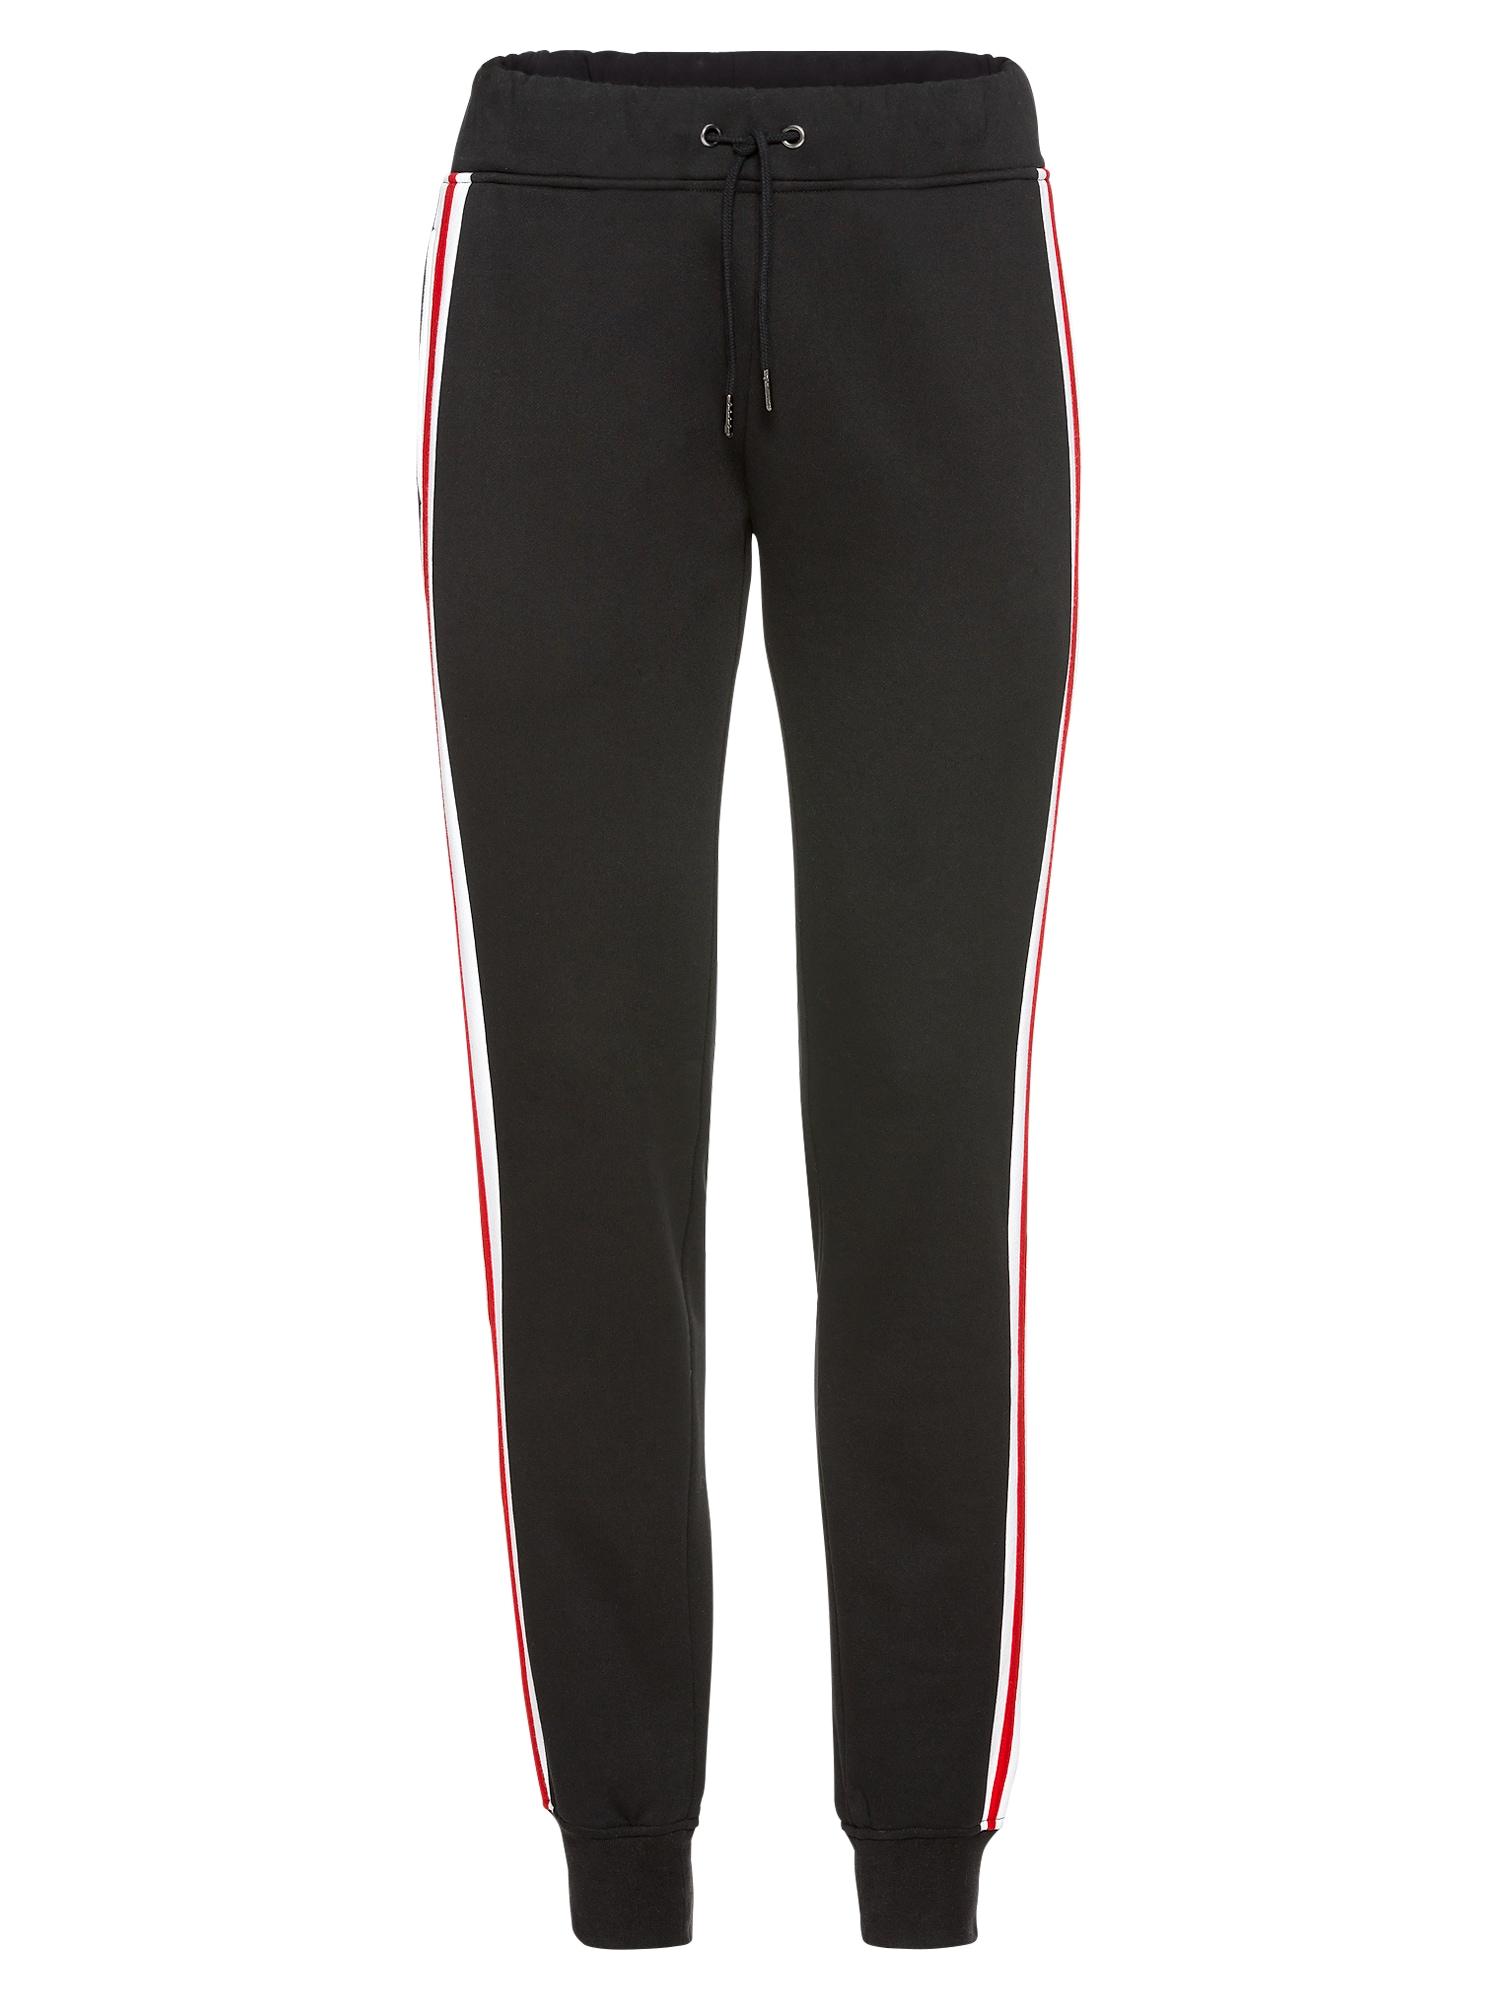 Kalhoty červená černá bílá Urban Classics